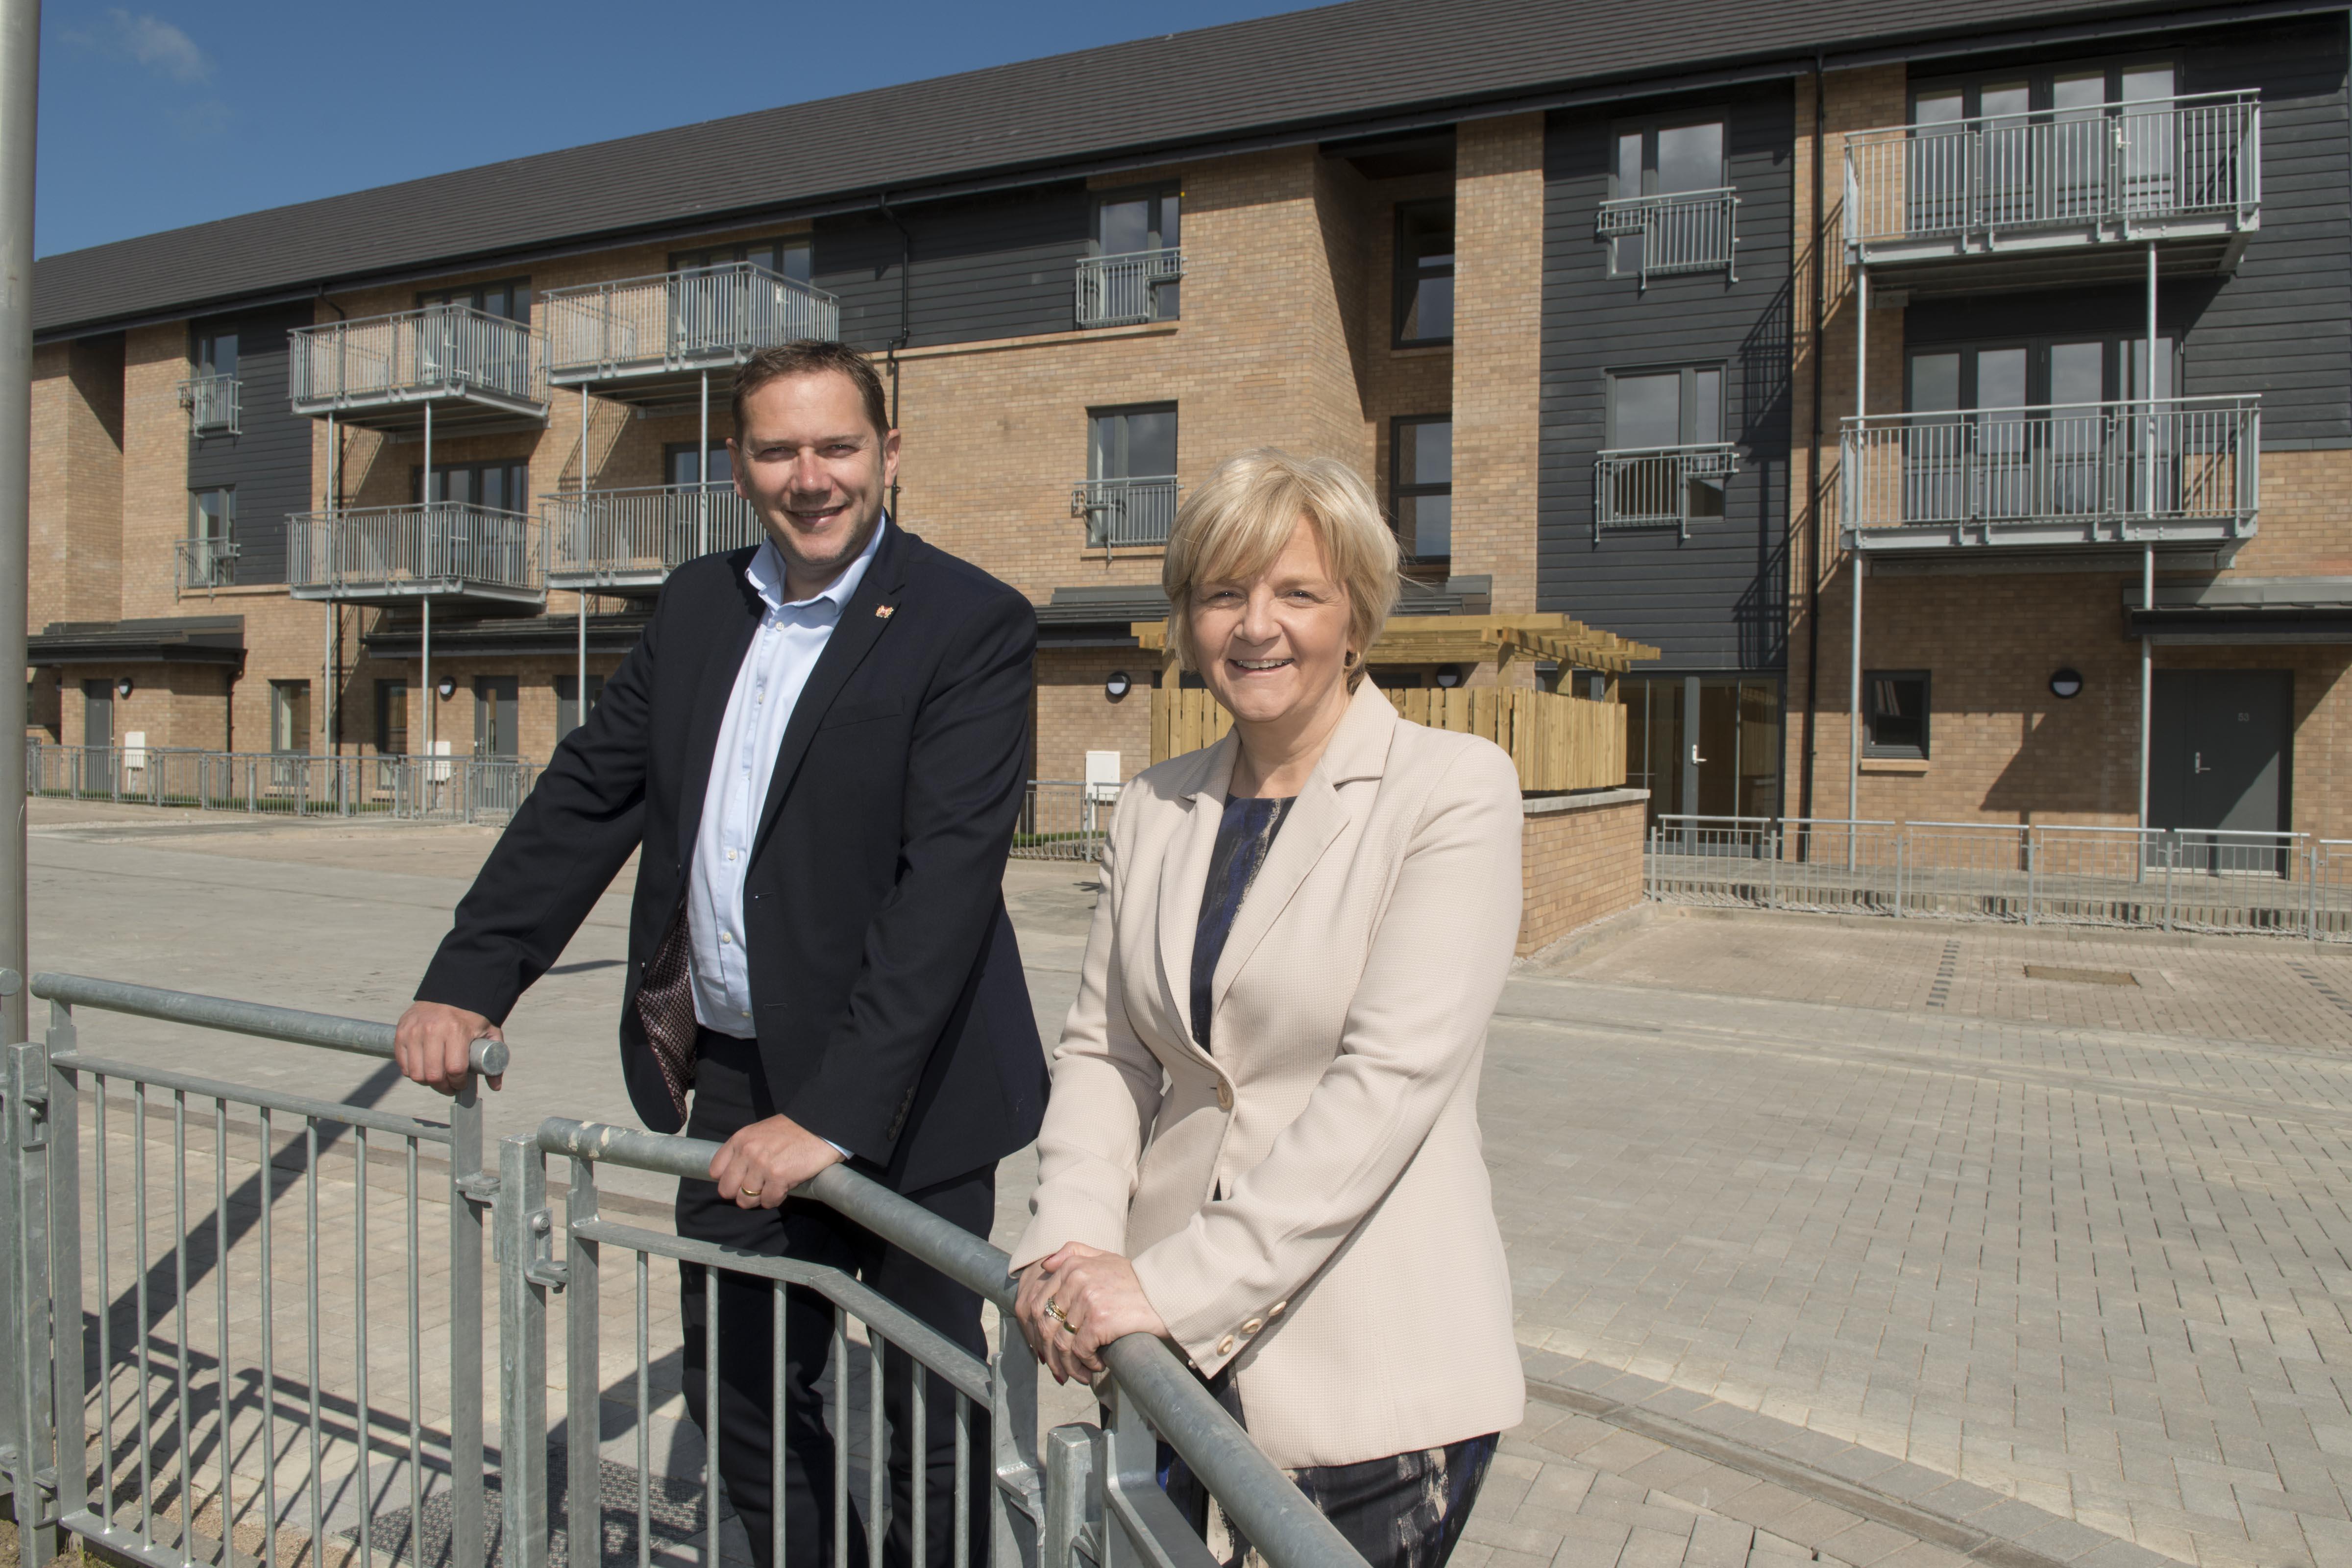 18/06/19 Councillor Jenny Laing and Councillor Douglas Lumsden